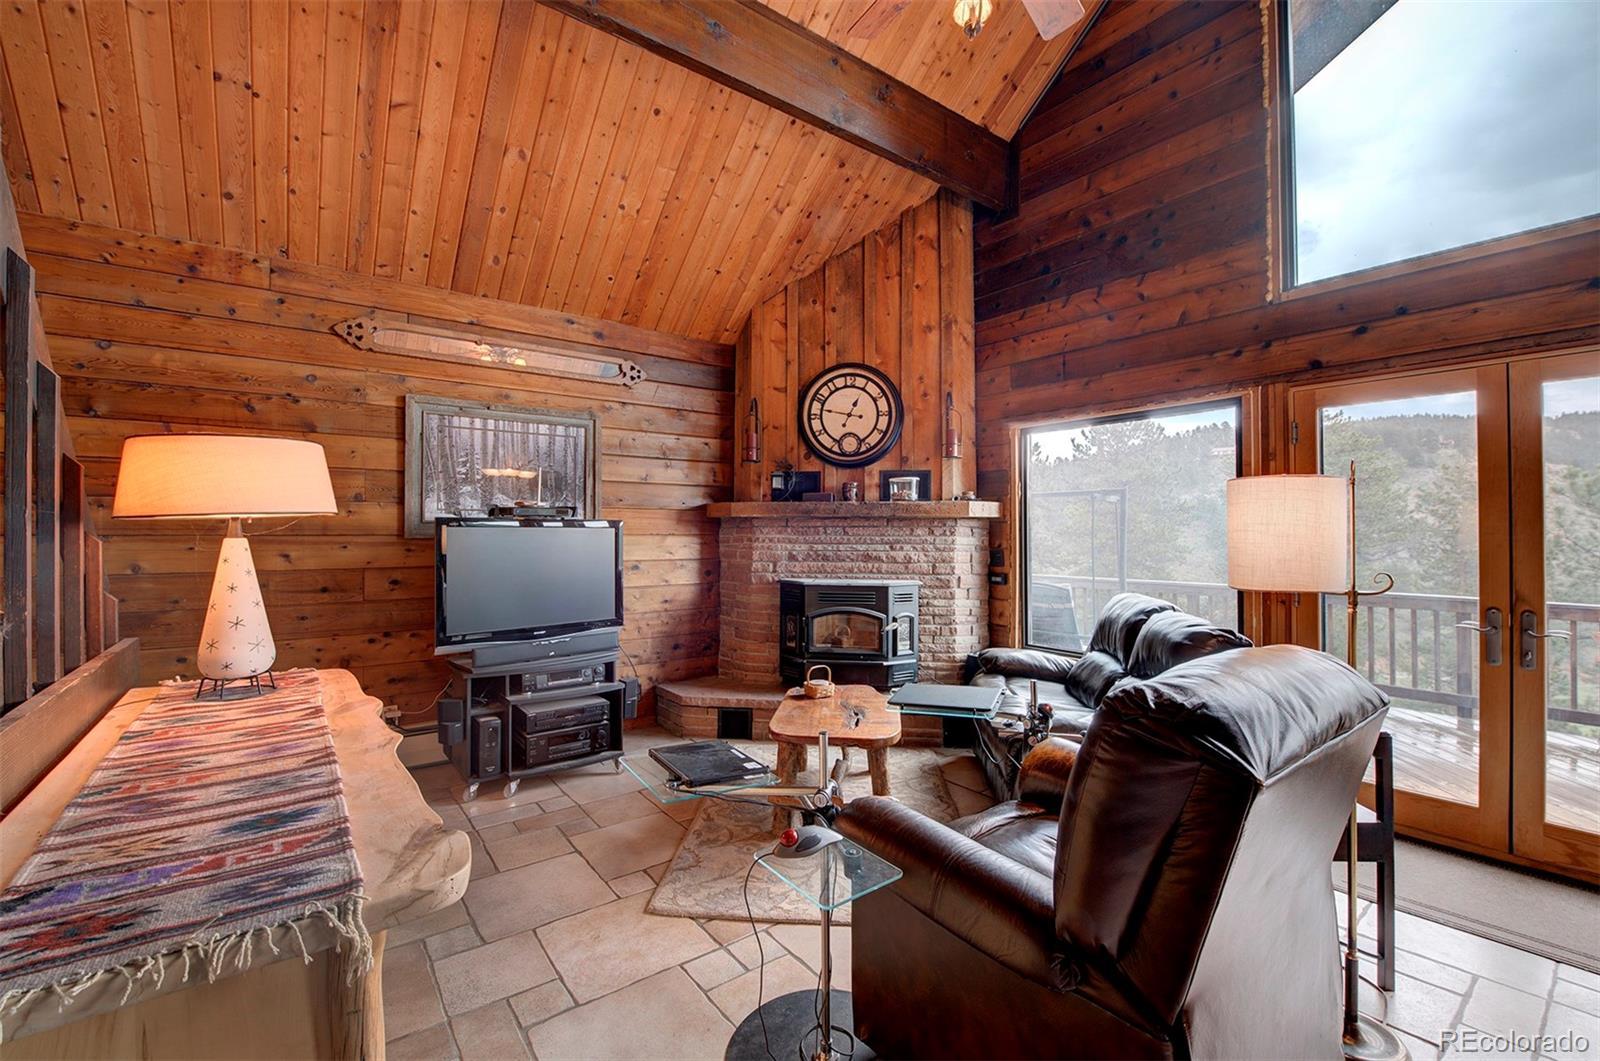 MLS# 6922377 - 8 - 12123 Geronimo Trail, Conifer, CO 80433